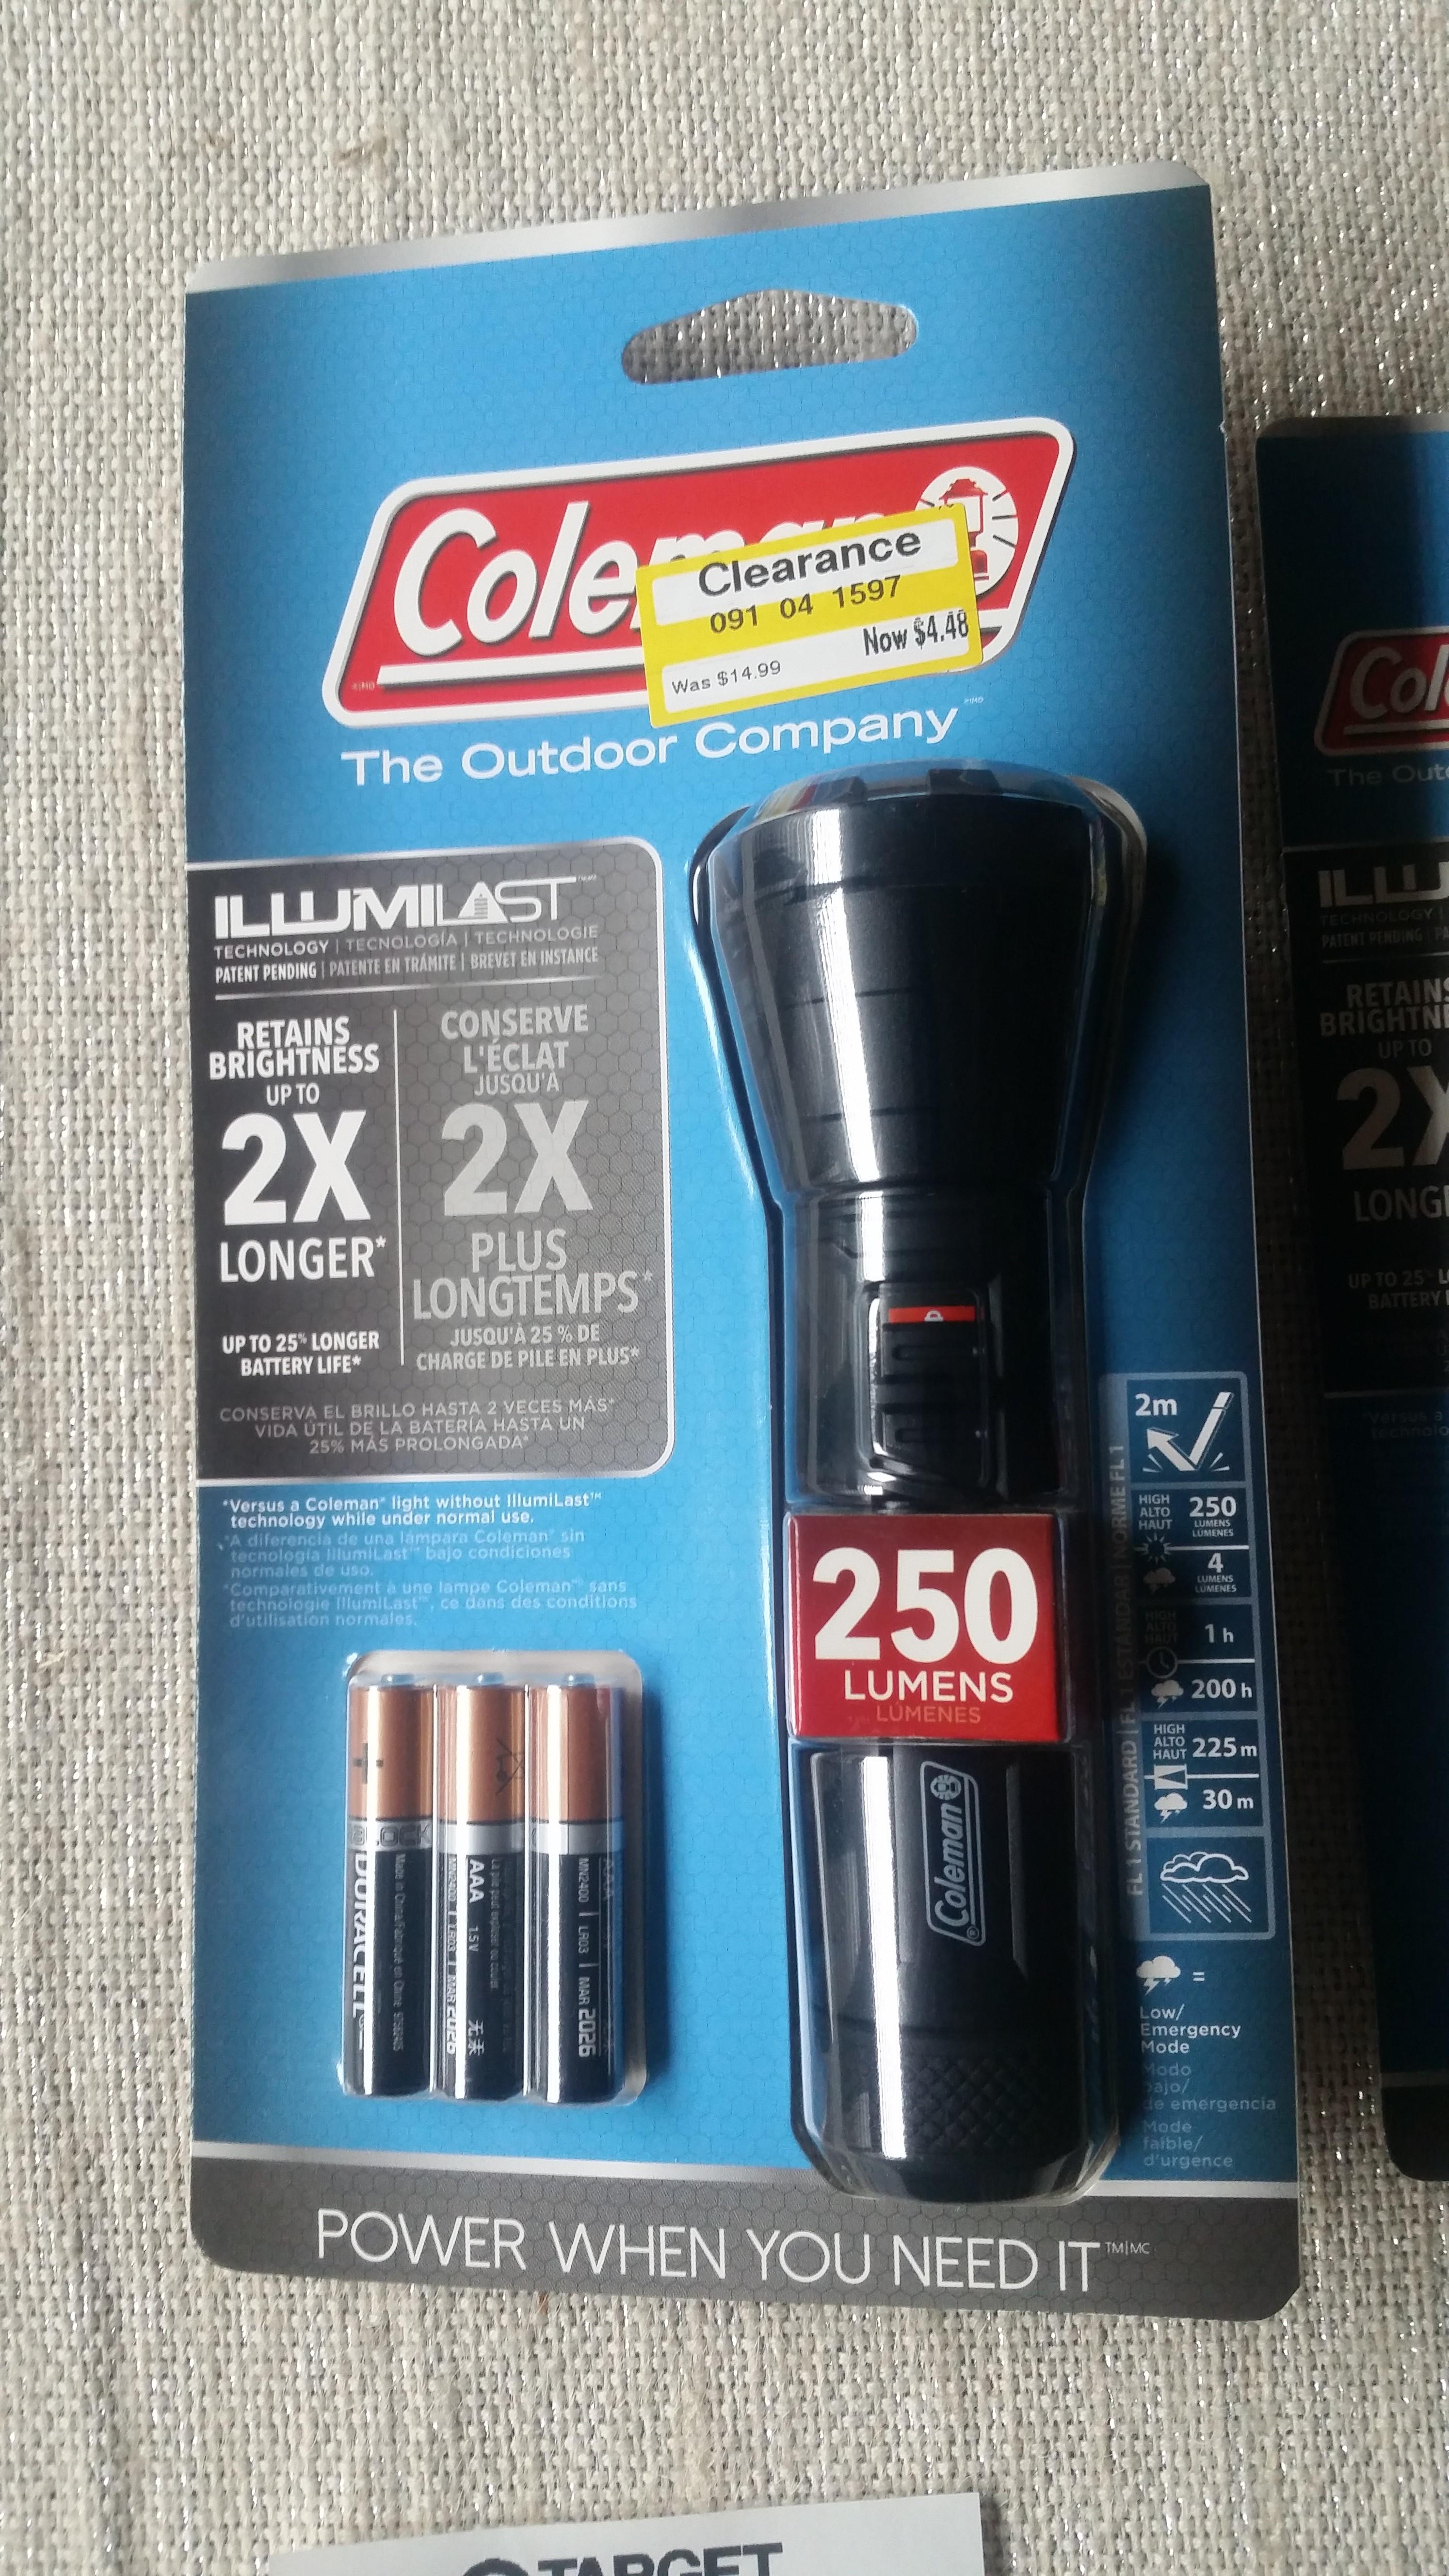 Target Coleman® Illumilast 250L LED Flashlight - Black YMMV $4.48